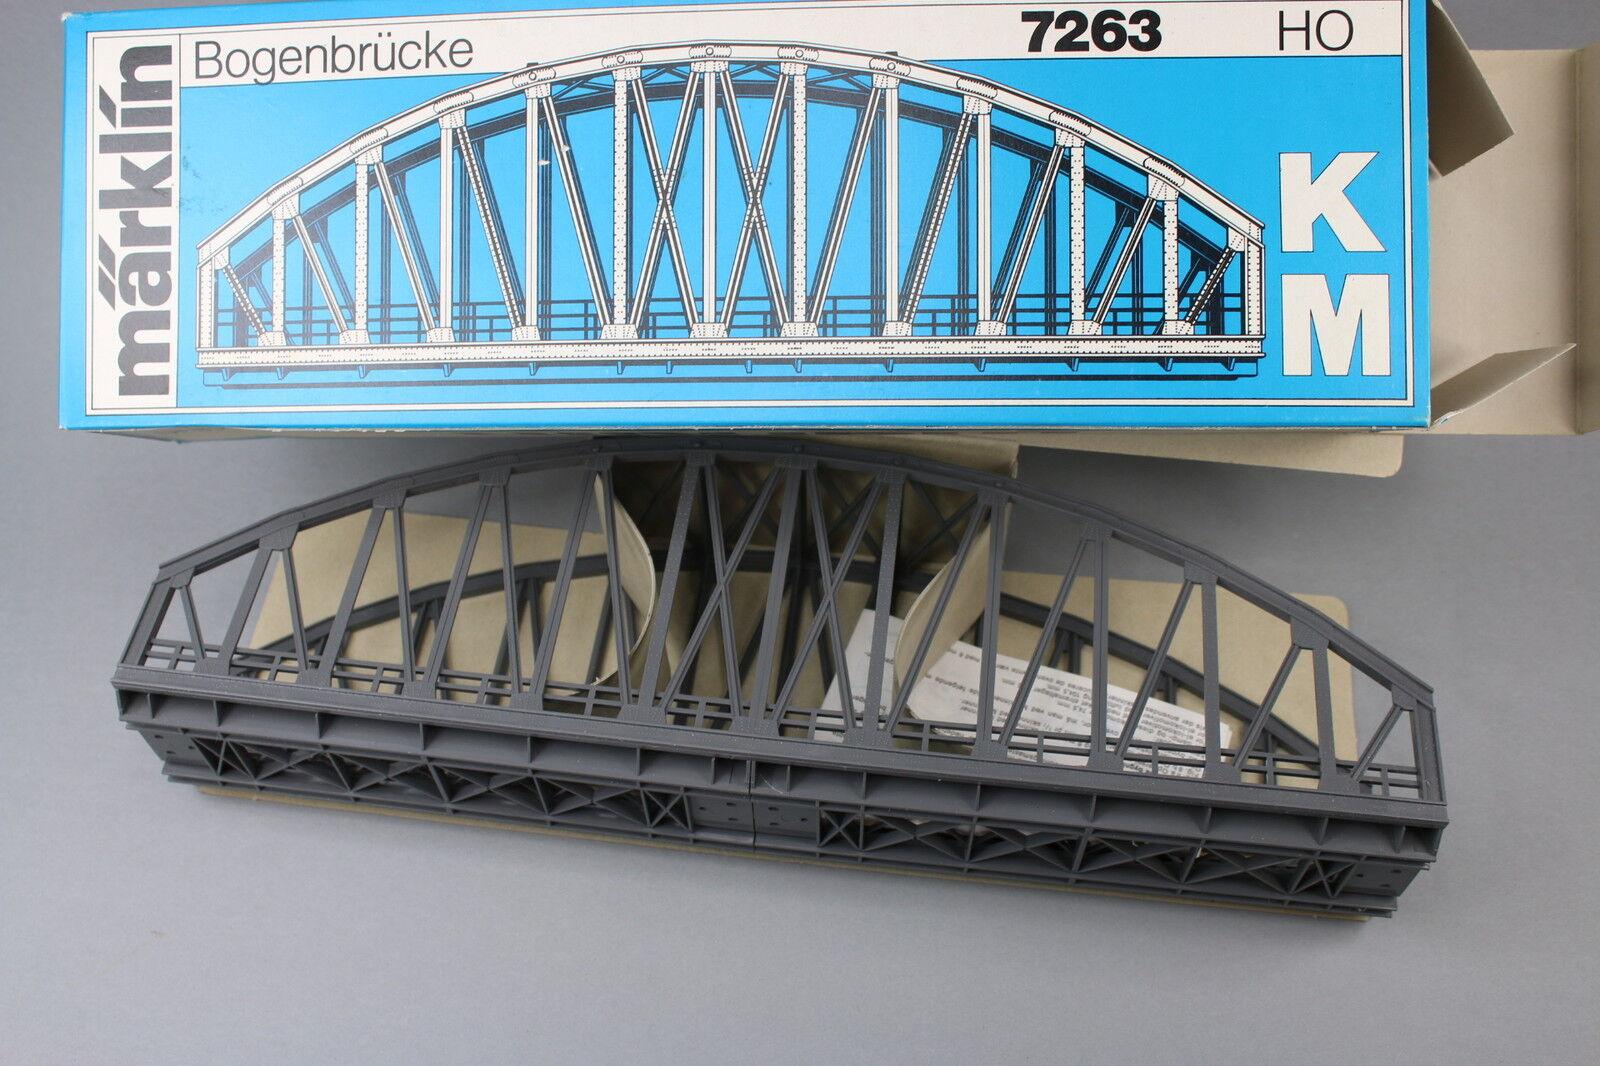 V206 Marklin train Ho Pont méttuttiique en arc 7263 Bogen brücke 36 cm marklin